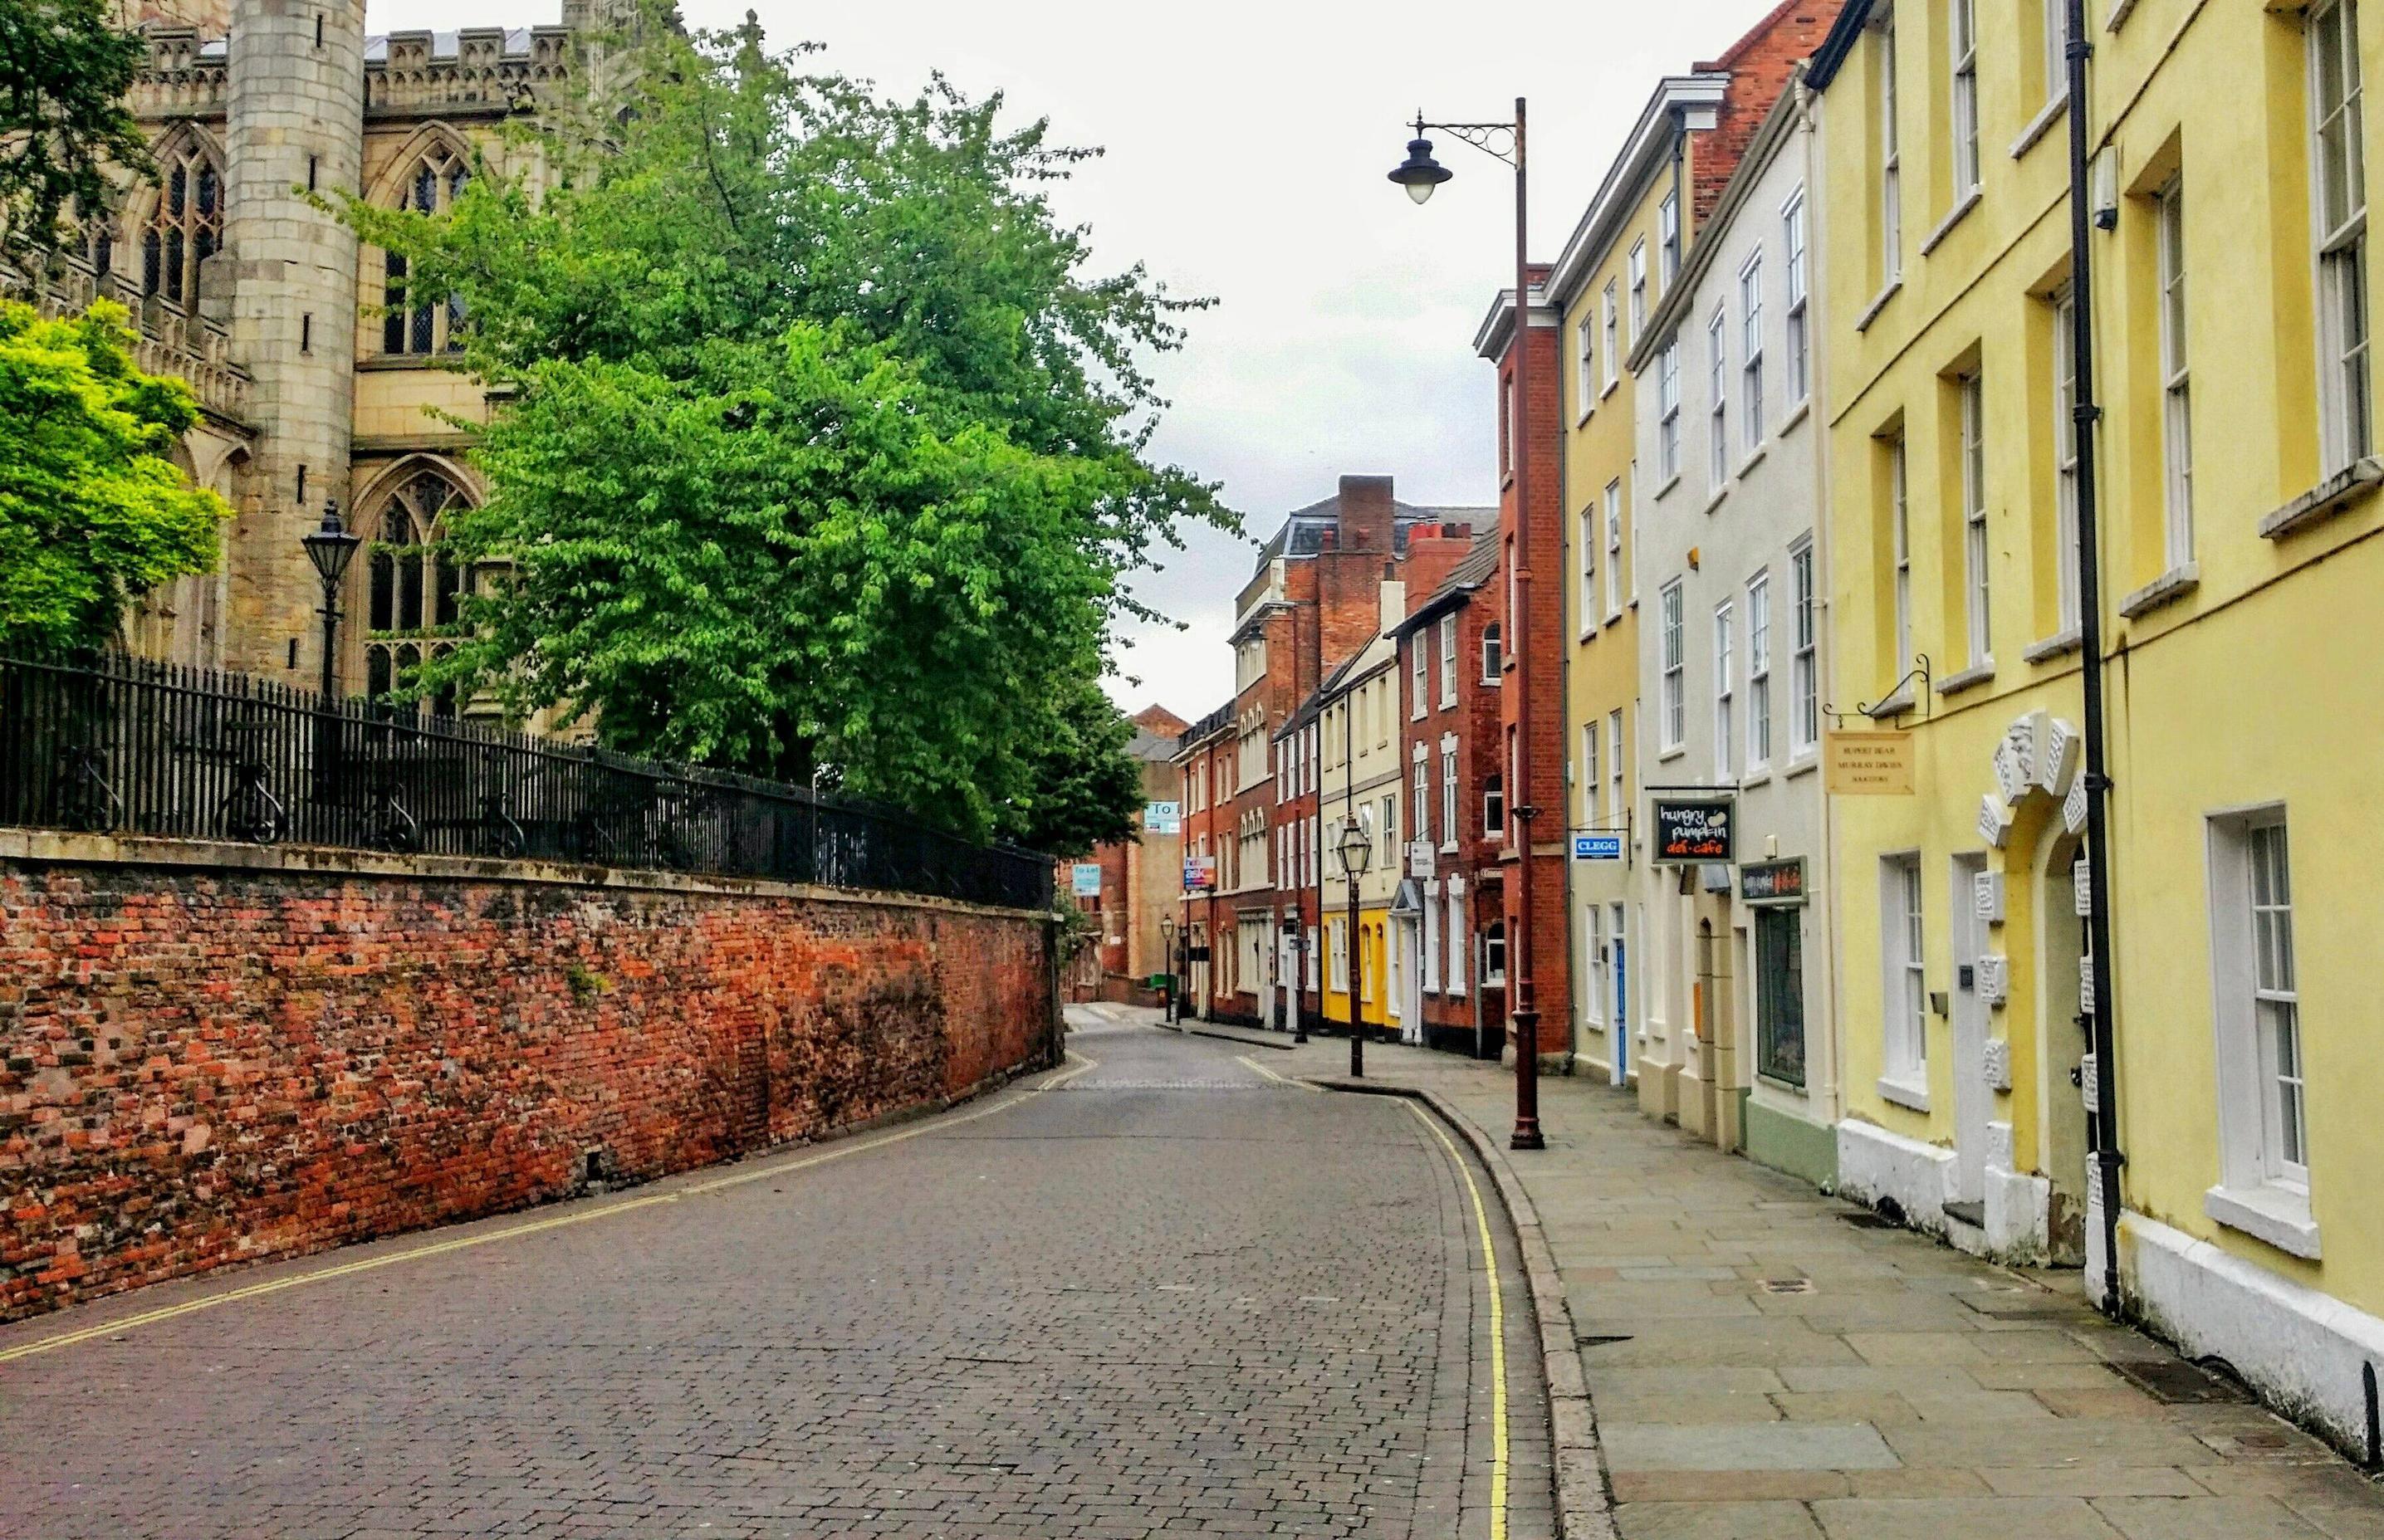 Hockley Nottingham - Imgur